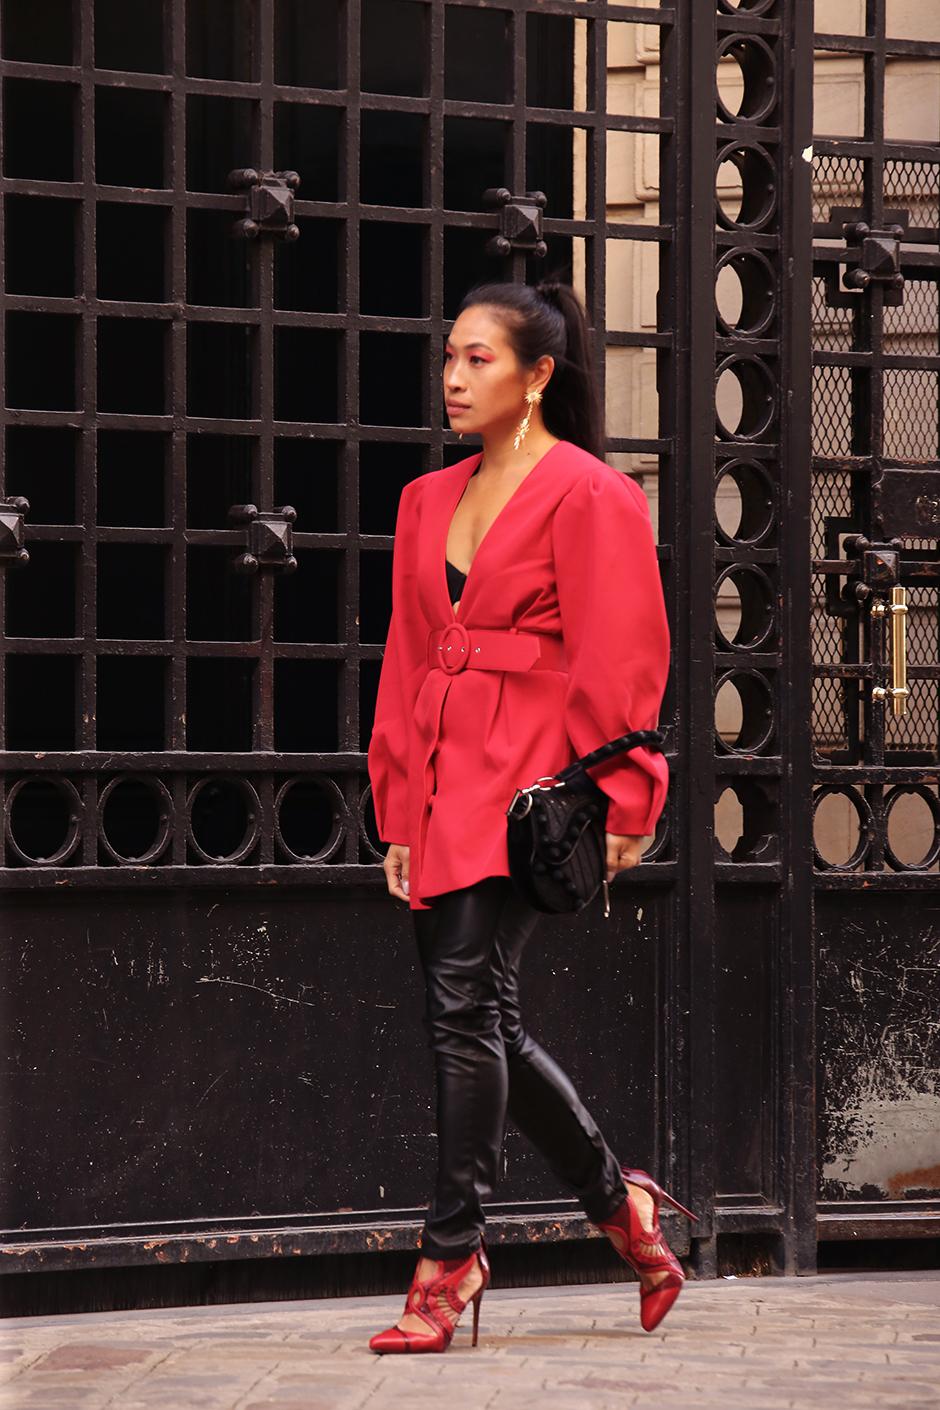 Paris Fashion Week Street Style Fall 2018 #Street #Fashion #Blog #Blogger #pfw #pfw2018 #ss18 #fw18 #parisfashionweek dior #diorbag #diorsaddle #metallo #metallicdress #silverdress #statementheels #Paris #France #fashionblog #styleblog #streetstyle #bestoutfit #falloutfit #beststyle #stylishoutfit #fallfashion #fallstyle #outfitinspo #outfitinspiration #outfitideas #leoparddress #versace #gianniversace #vintageversace #leopard #animalprint #fallfashion #kneeboots #beret #manoloblahnik #vintagefendi #fendibaguette #fendi #fendibag #revolve #revolvearoundtheworld